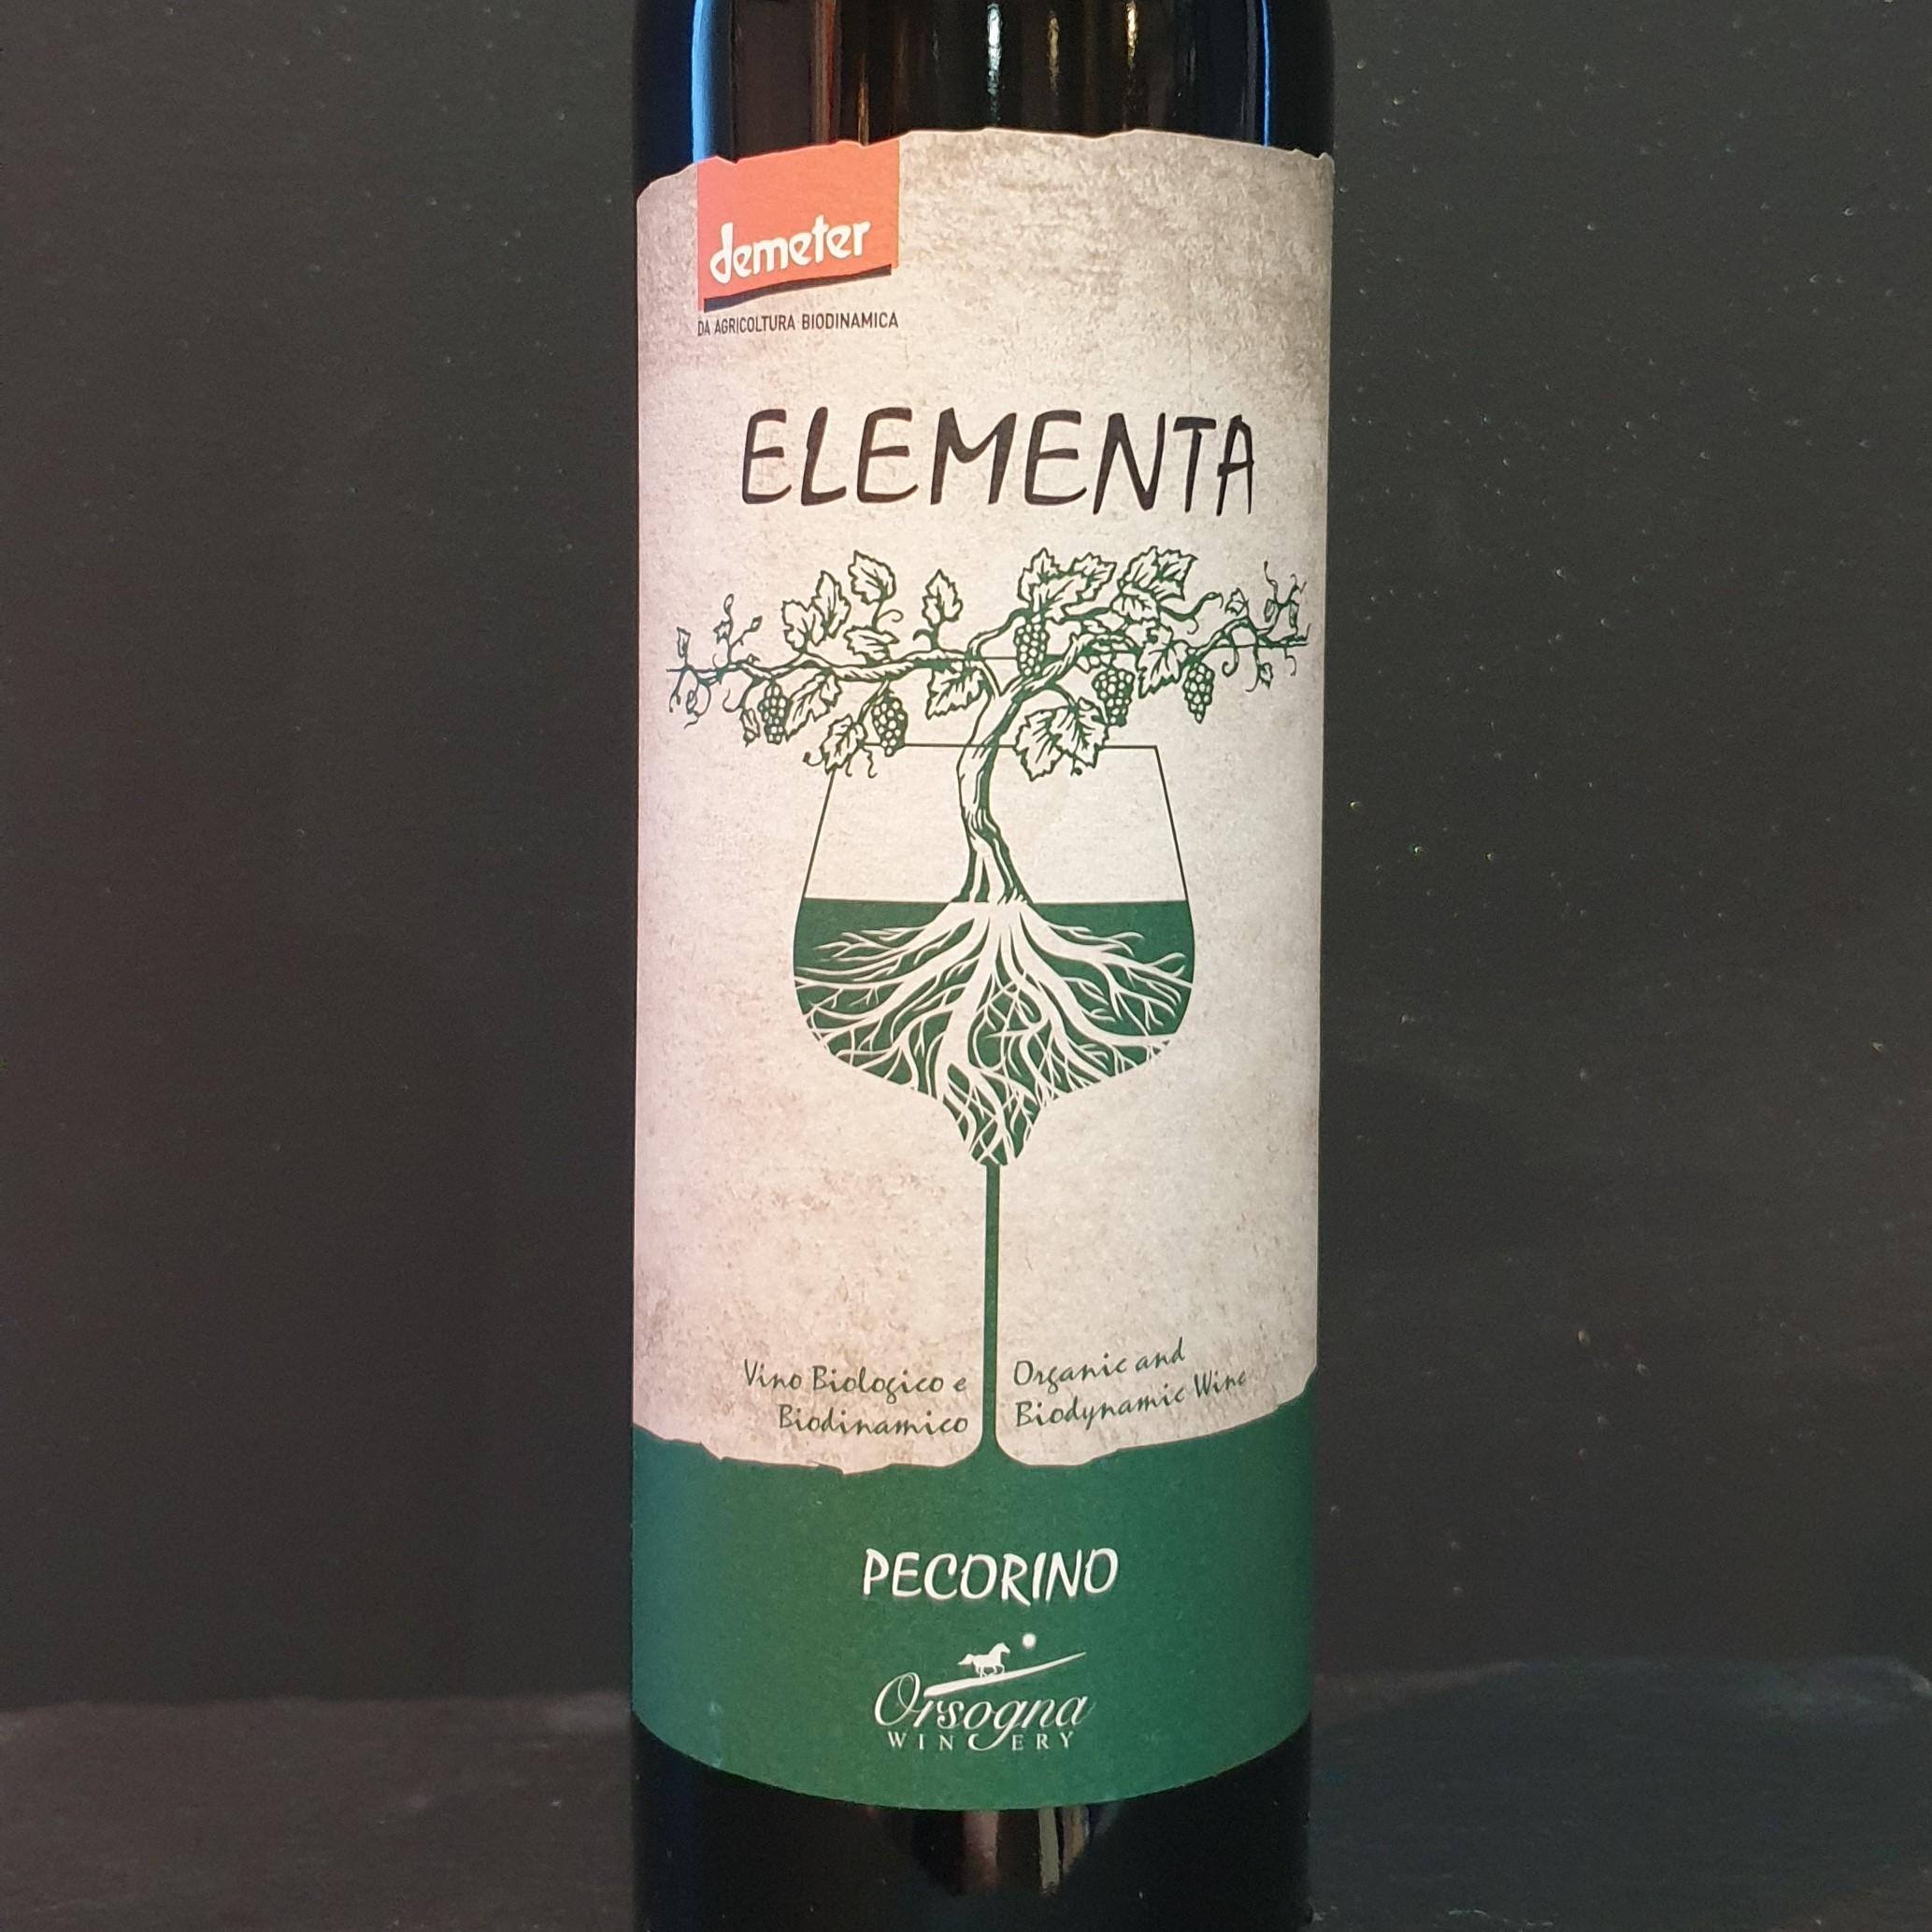 Elementa Pecorino